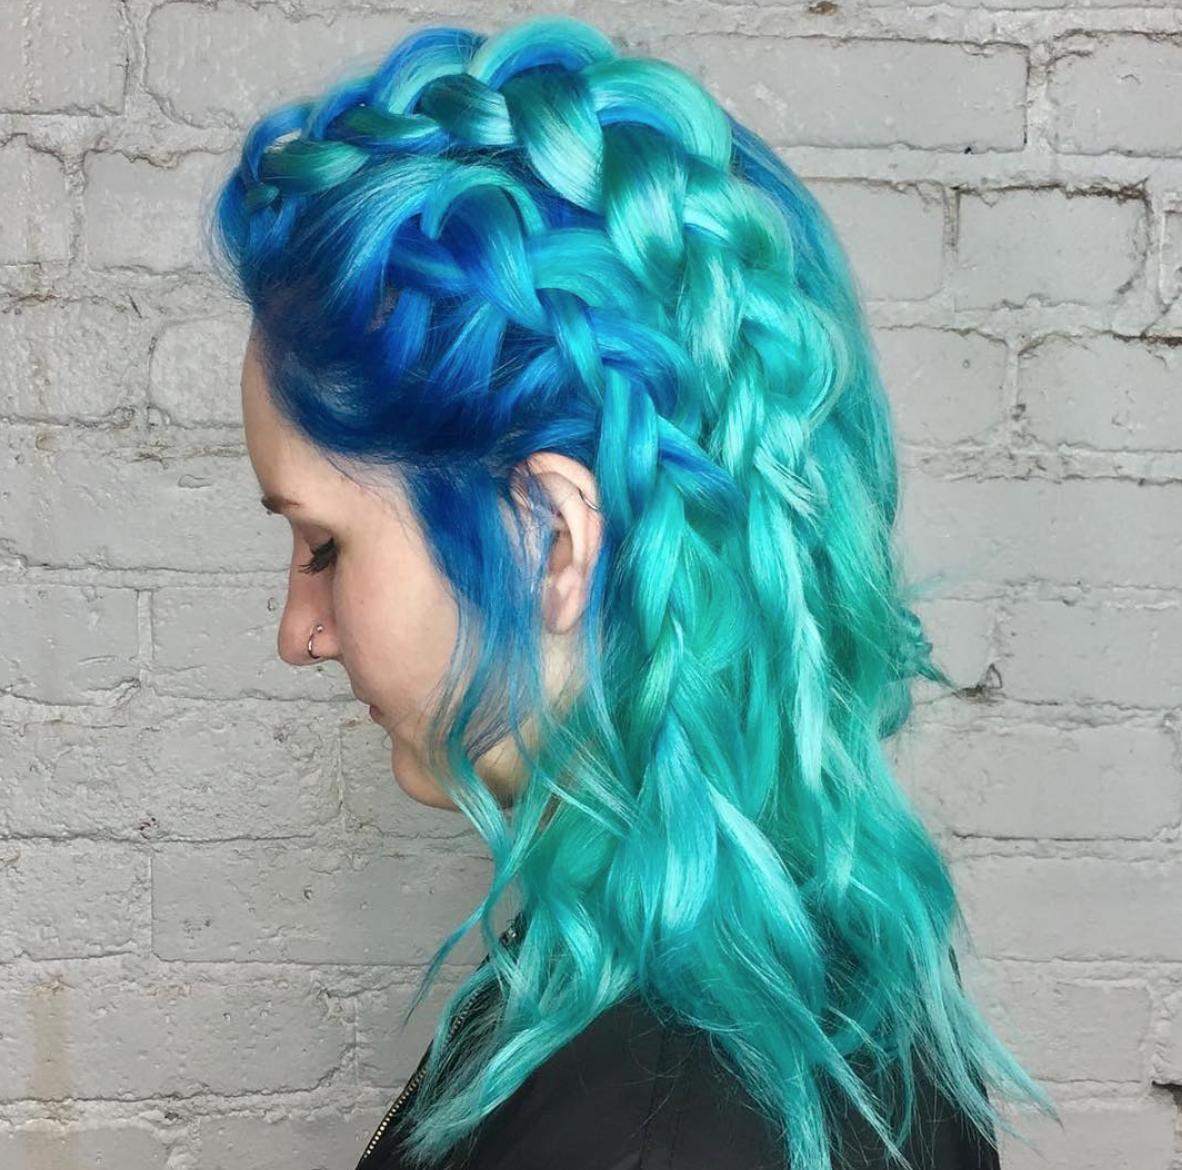 Cut color by holly king ue theory hair salon ue montana theory